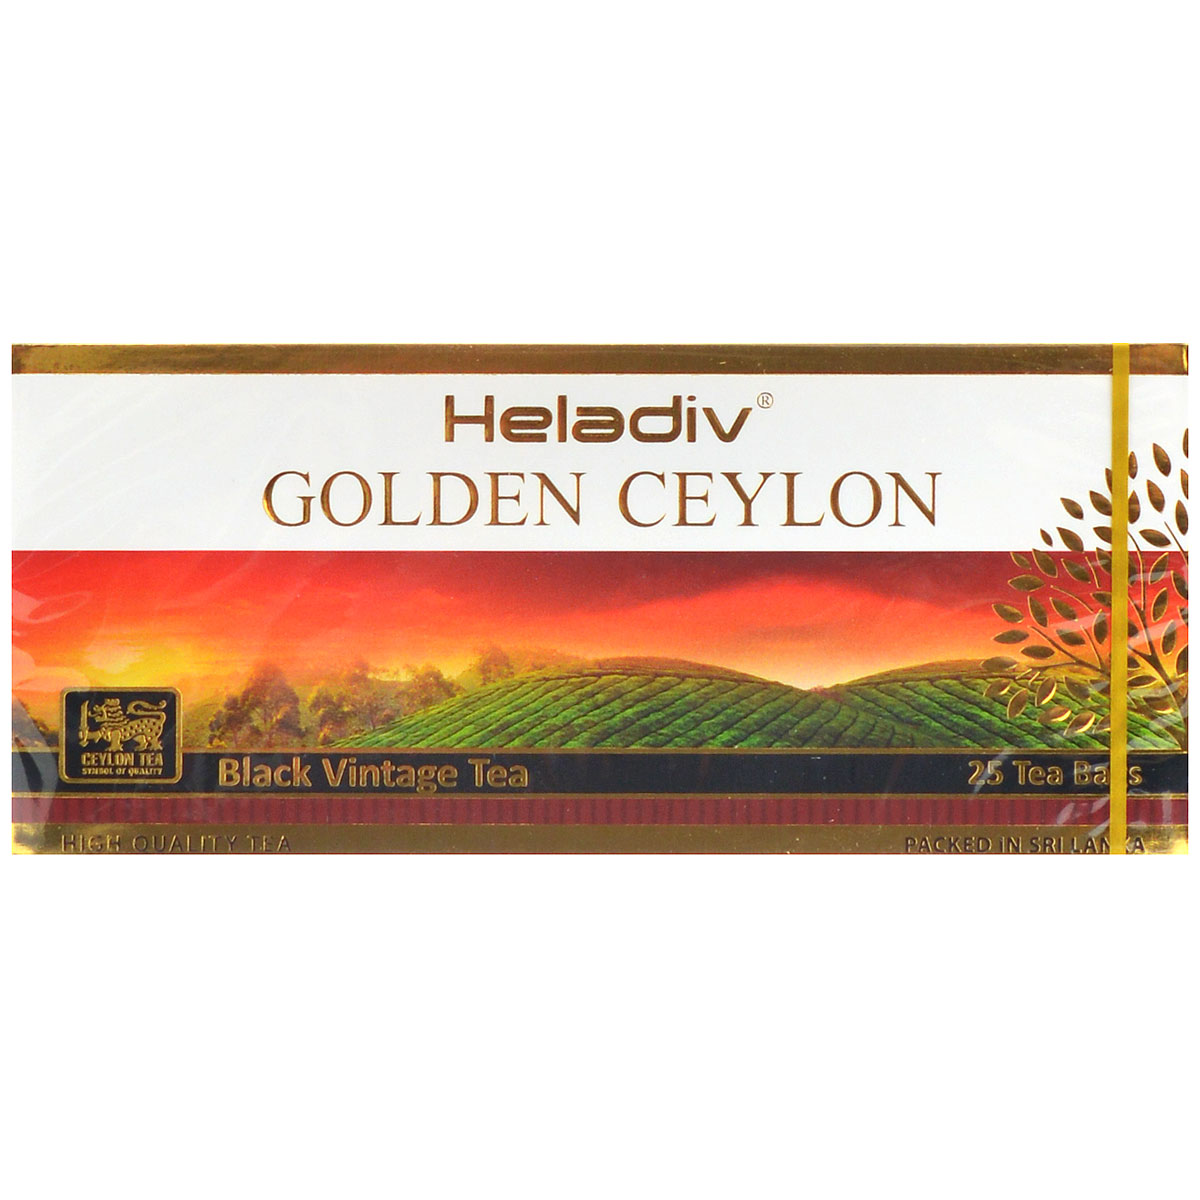 Heladiv Golden Ceylon Vintage Black черный пакетированный чай, 25 пакетиков fashion quartz gold two horse pocket watch antique man classic vintage fob watches men retro golden color black arabic hour gift